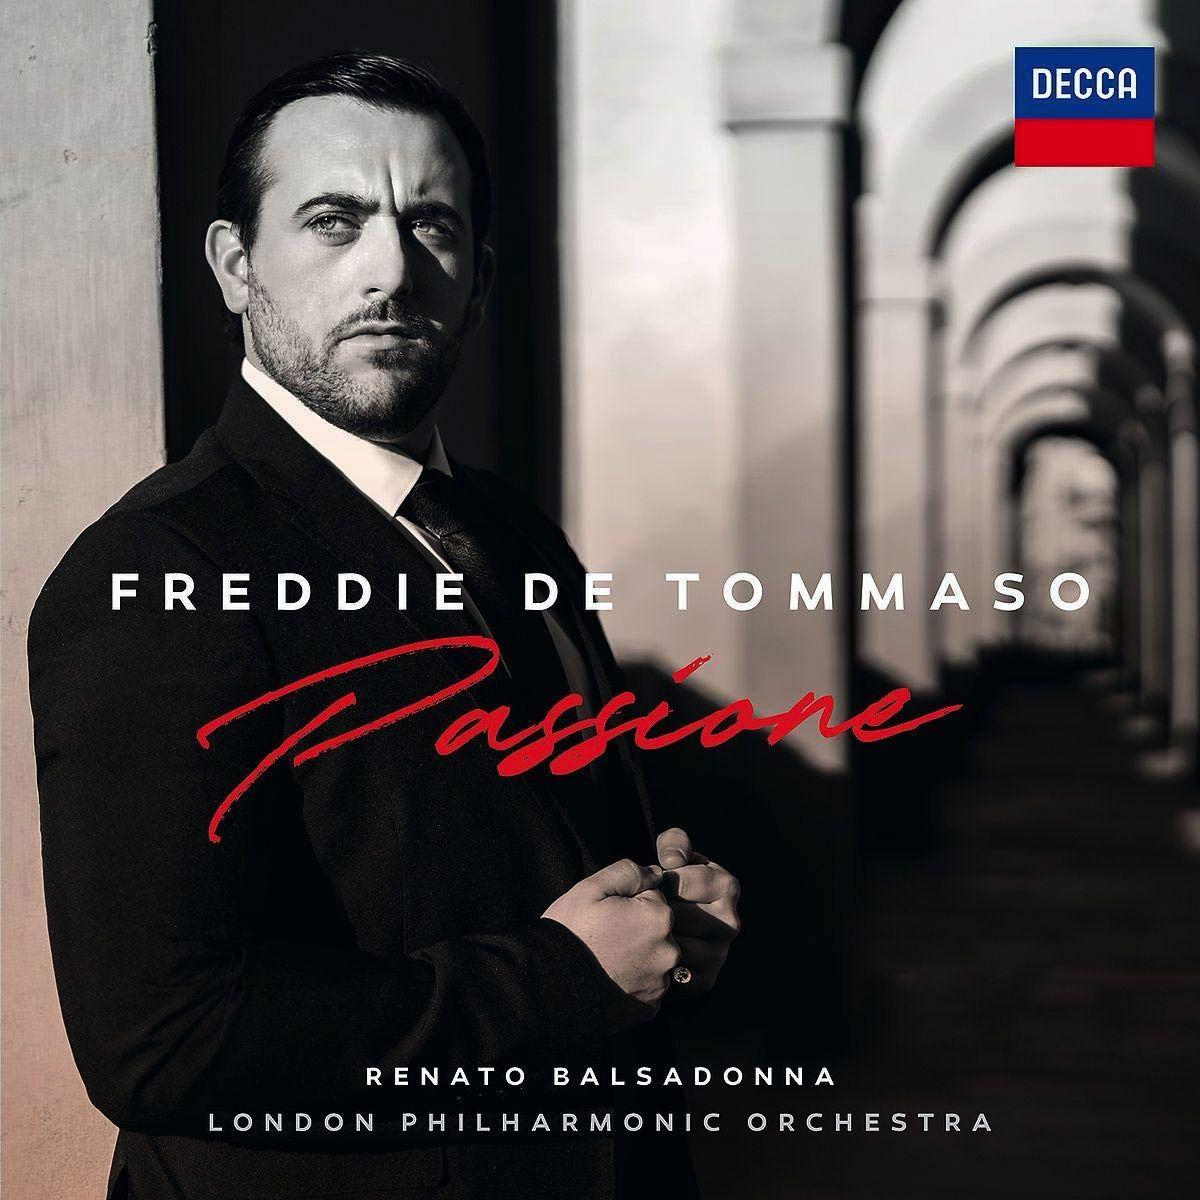 CD-Besprechung, Freddie De Tommaso, Passione  klassik-begeistert.de